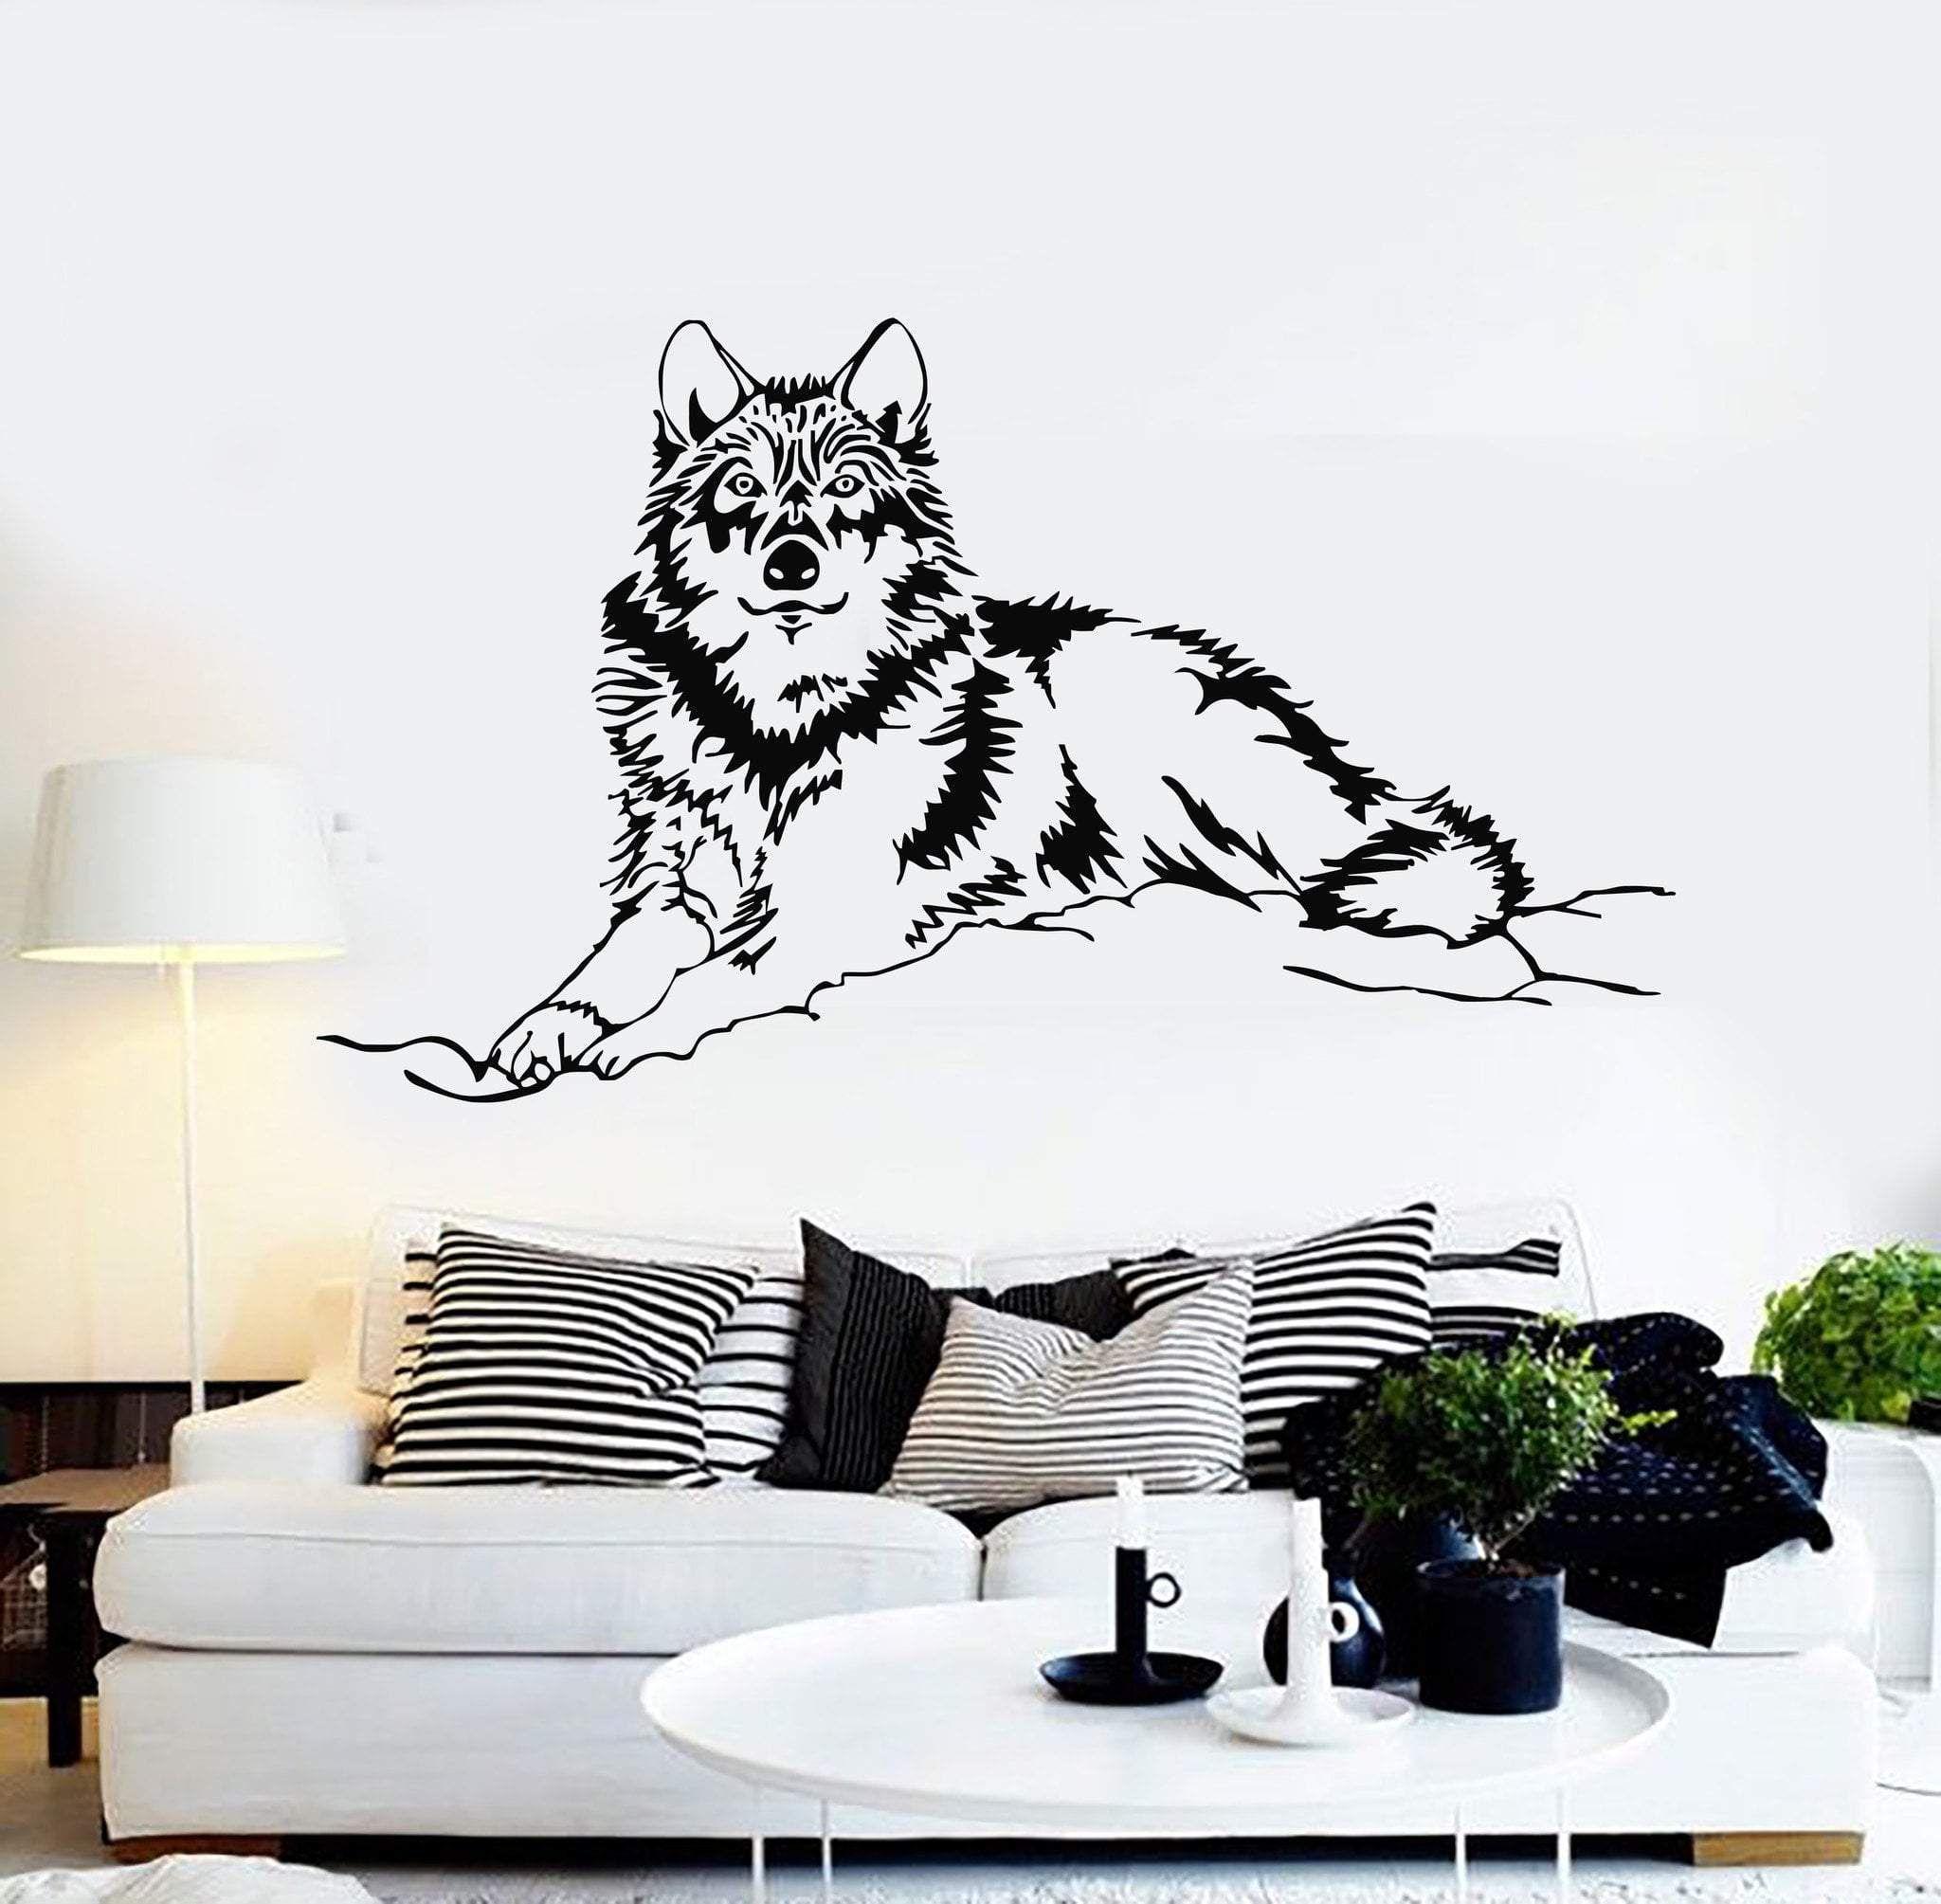 BALD EAGLE ARTWORK Animals Decal Removable WALL STICKER Home Decor Art Mural